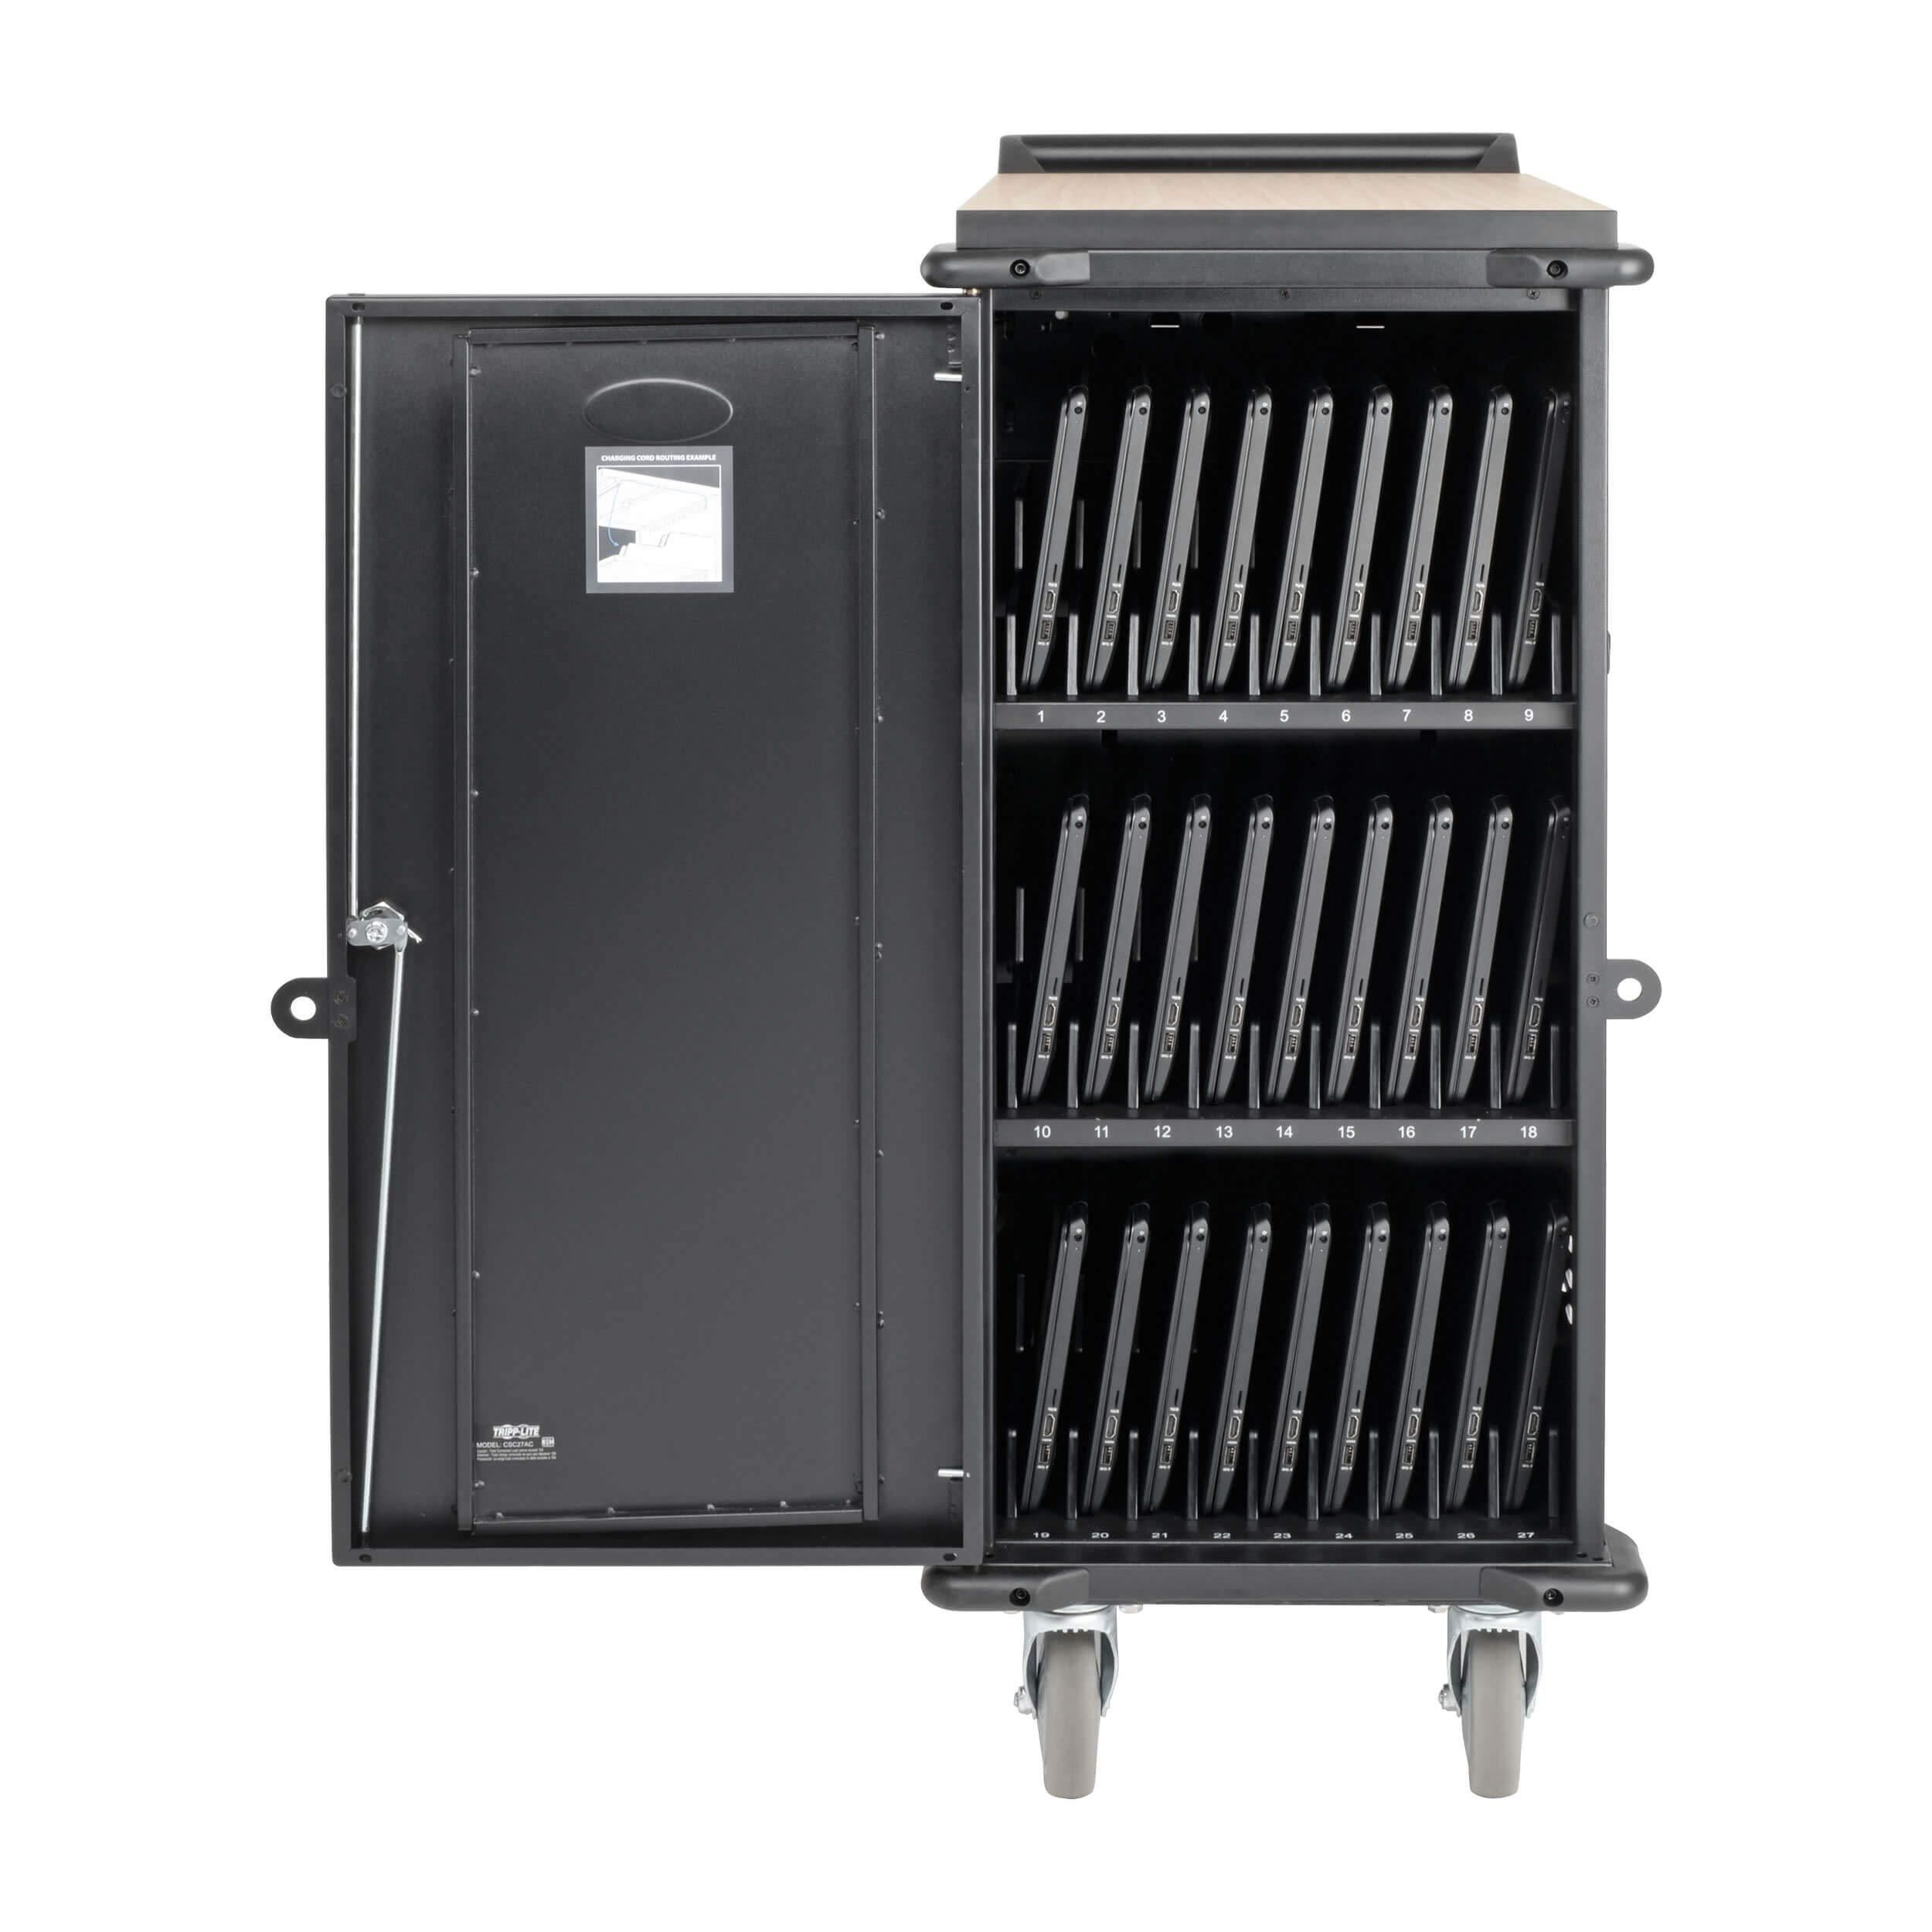 Tripp Lite 27-Port AC Mobile Charging Cart Storage Station for Chromebooks, iPads, Laptops, Tablets, Black (CSC27AC) by Tripp Lite (Image #3)